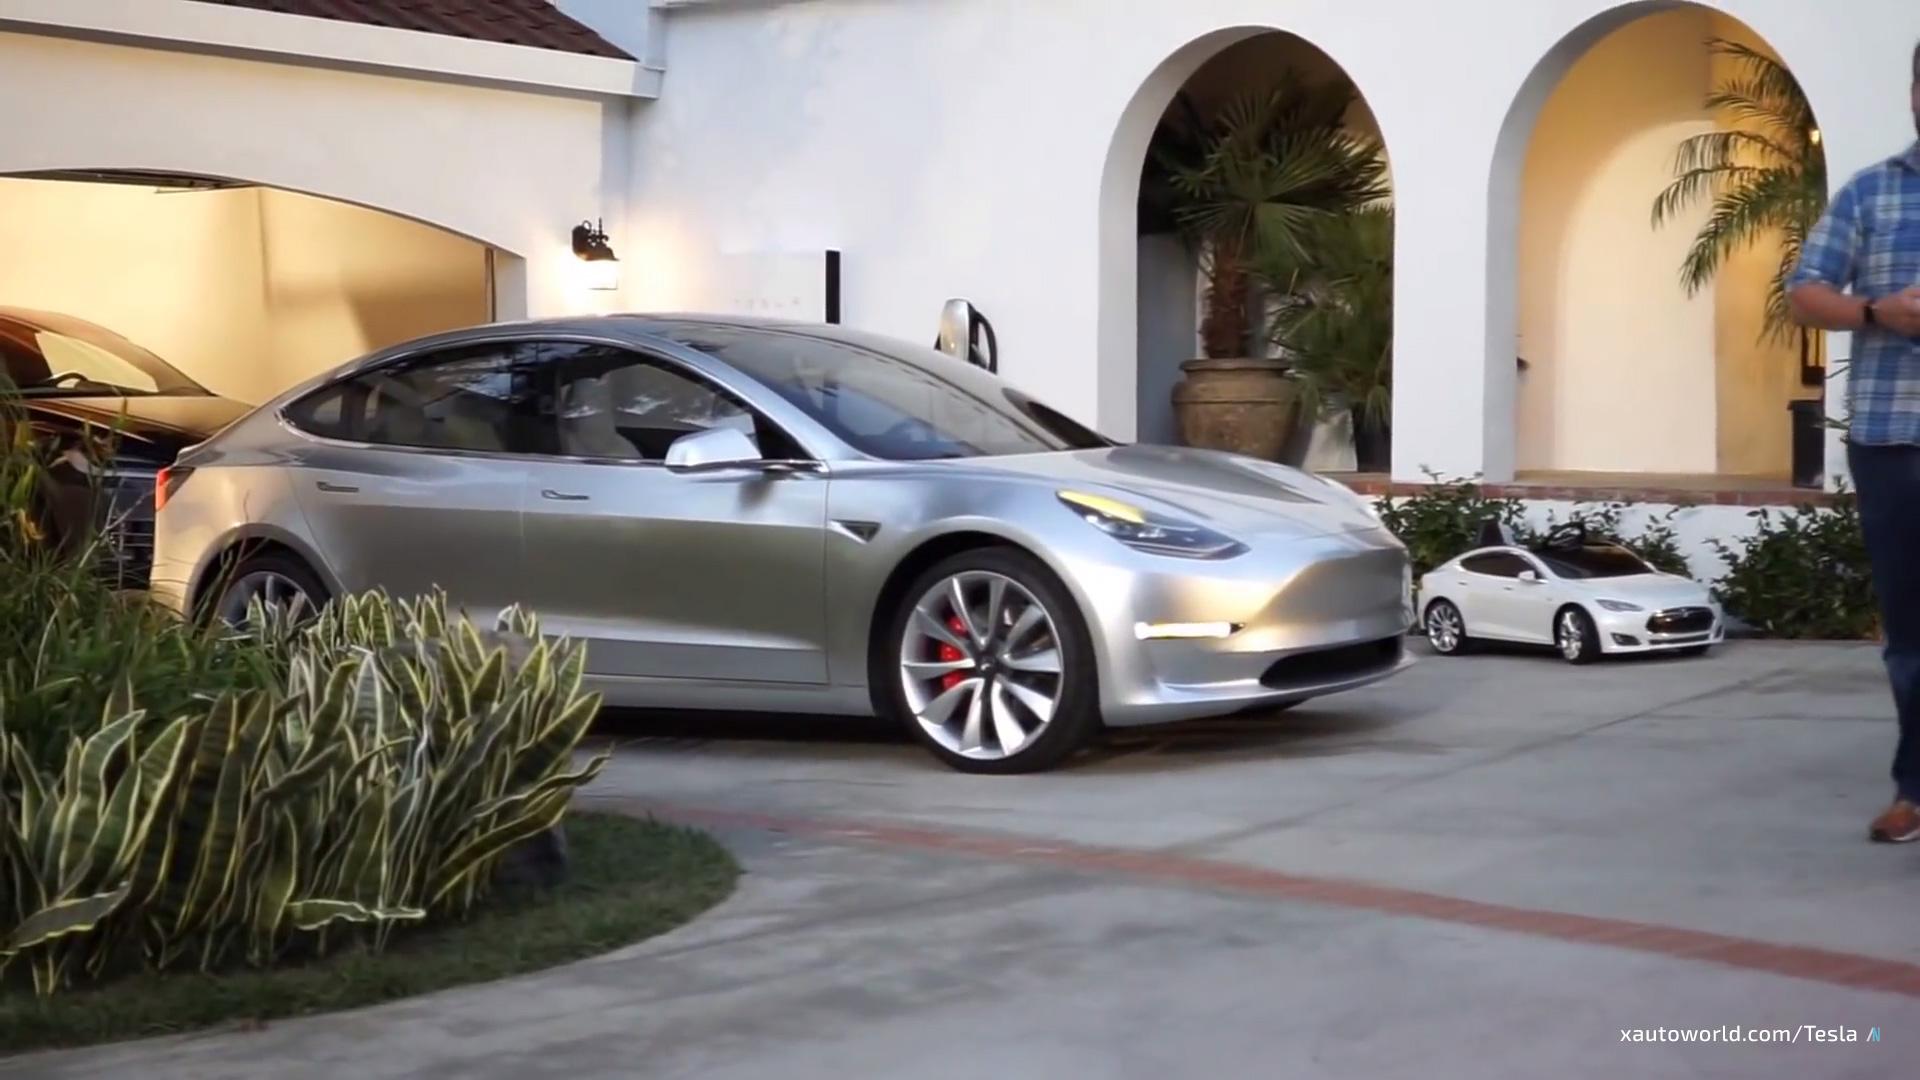 Exclusive Model 3 HD Photos & Video from Tesla Powerwall 2 ...